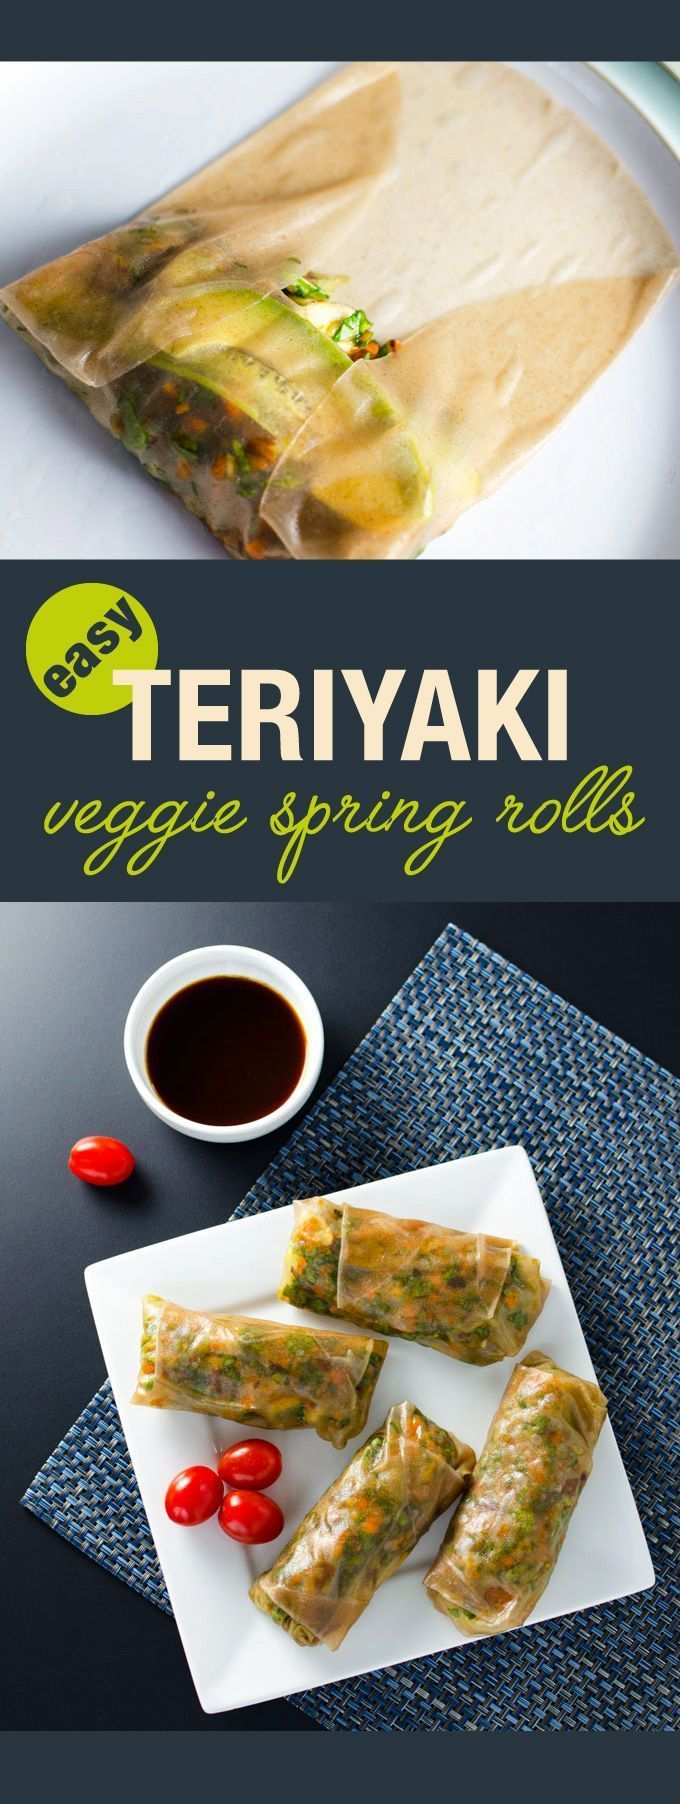 A quick, simple meal - Teriyaki Veggie Spring Rolls #vegan #glutenfree